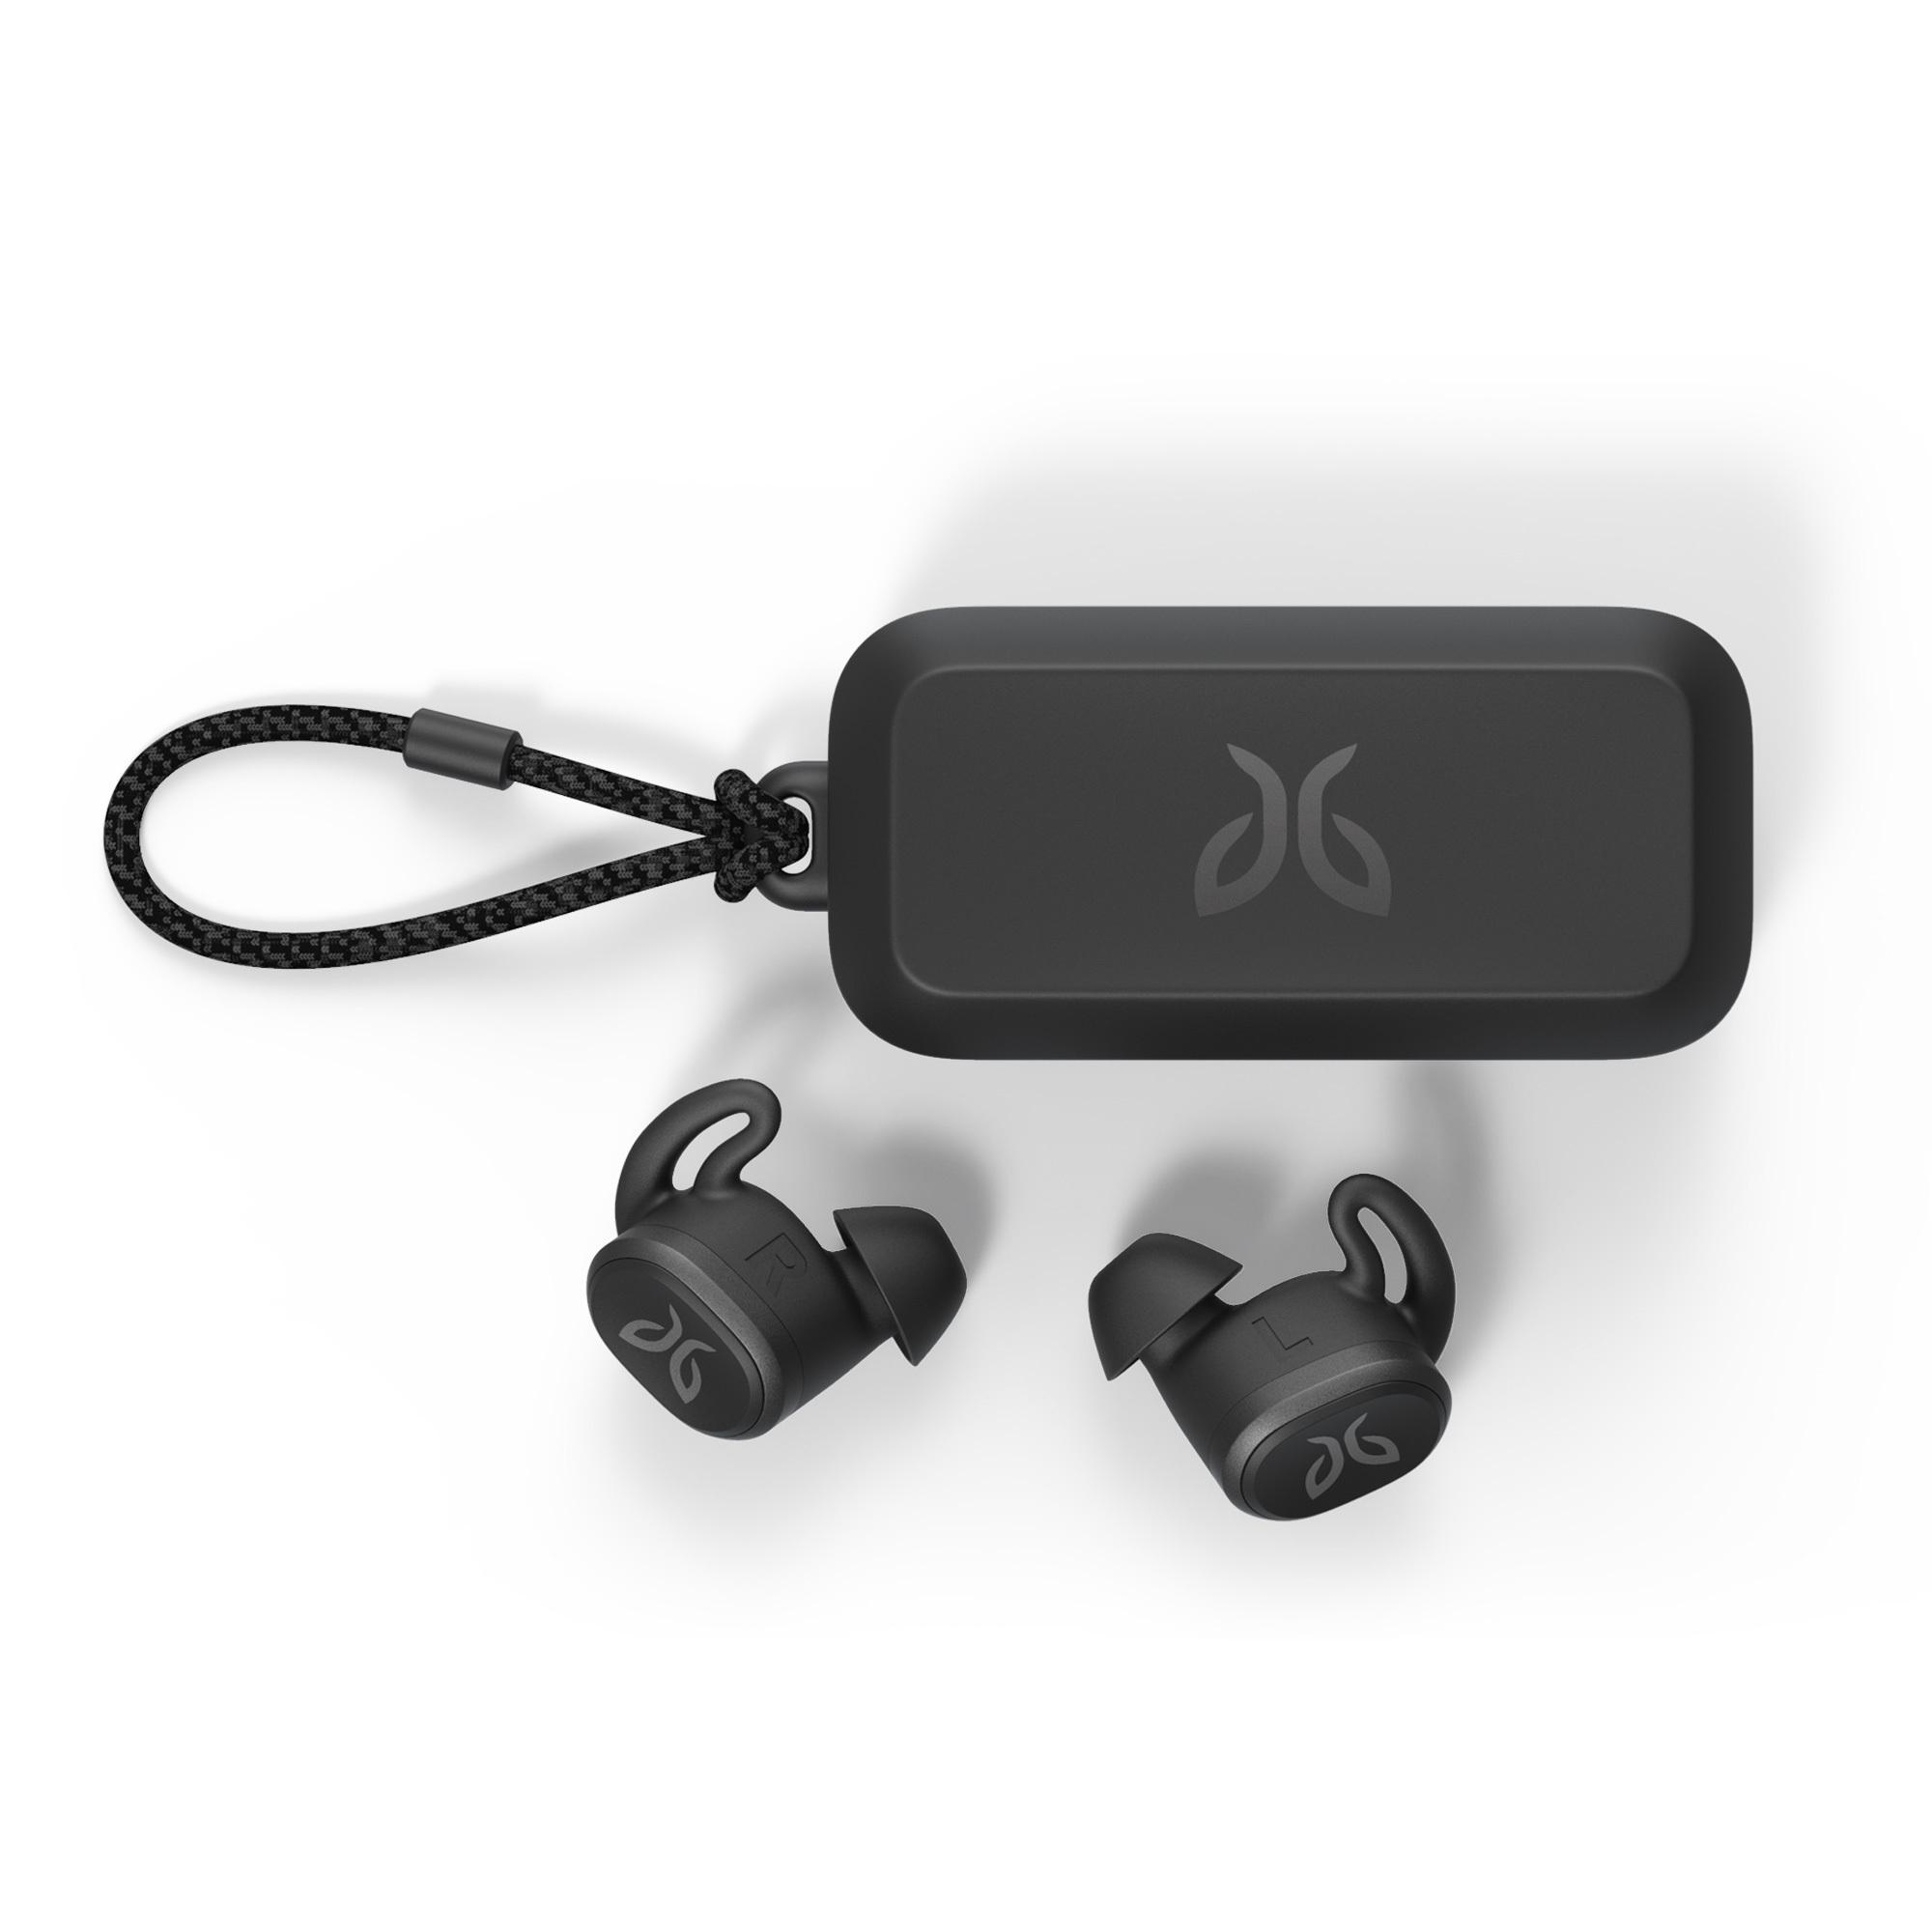 Jaybird's New VISTA™ Totally Wireless Headphones Redefine